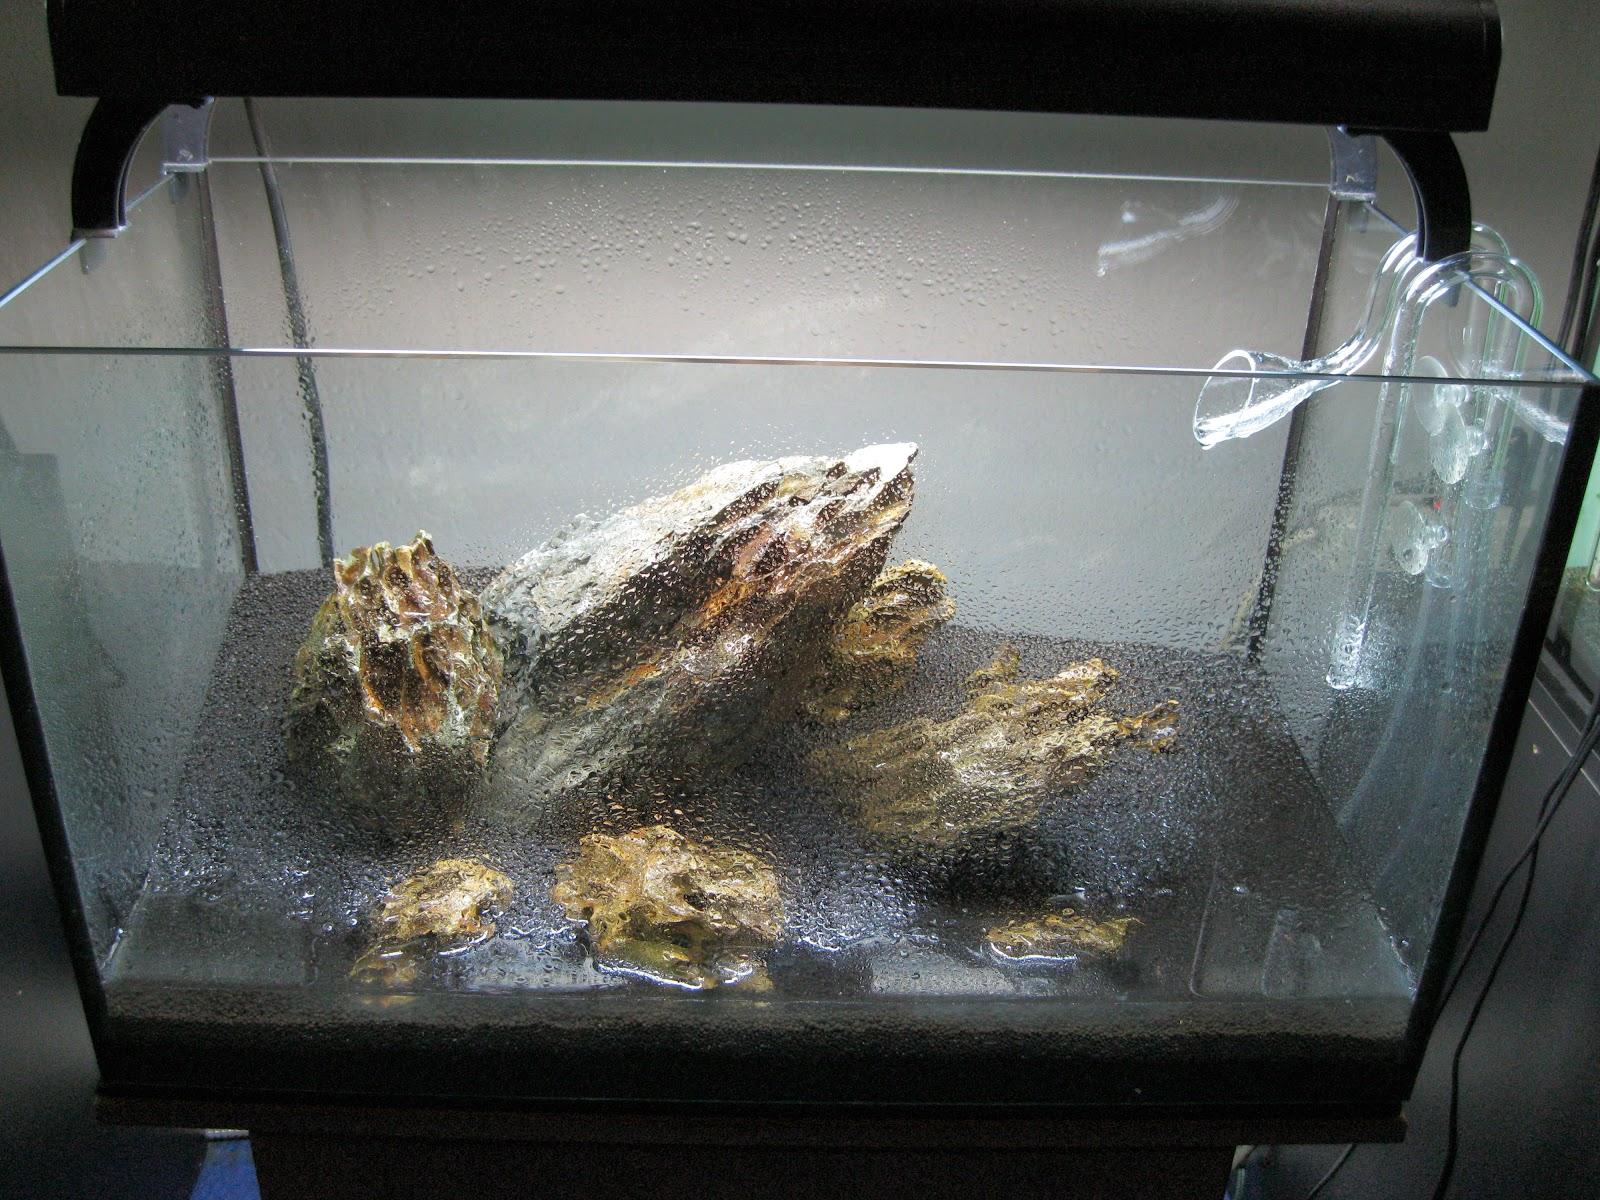 New Aqua Stone Humidifier bunda daffa.com #7B6A50